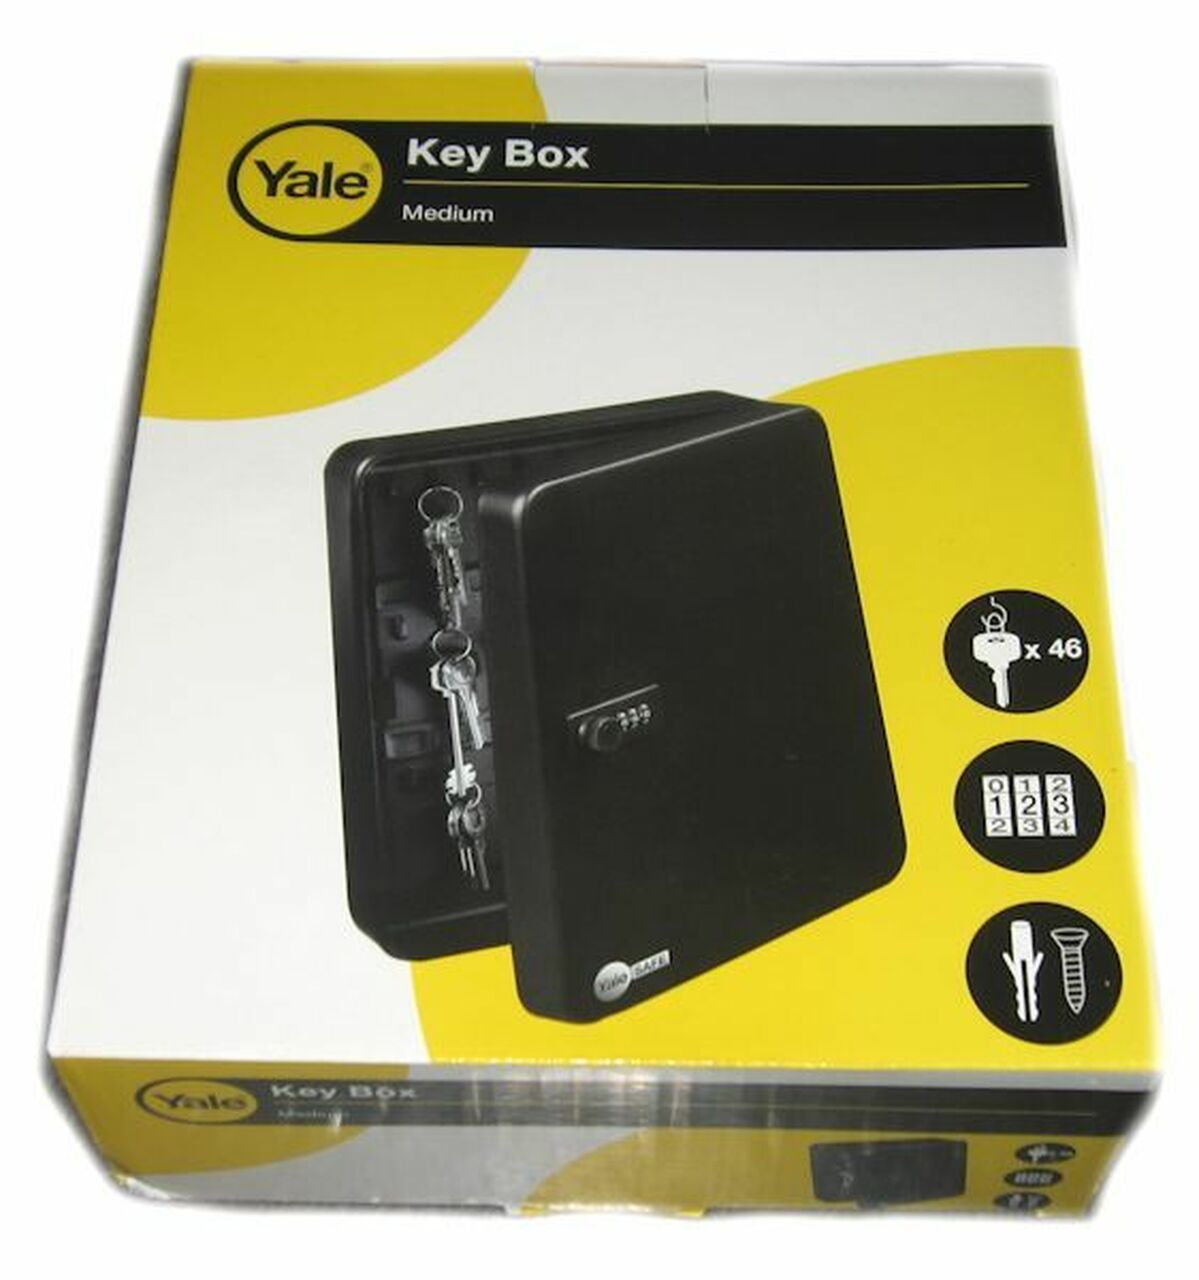 Key Cabinets by Yale